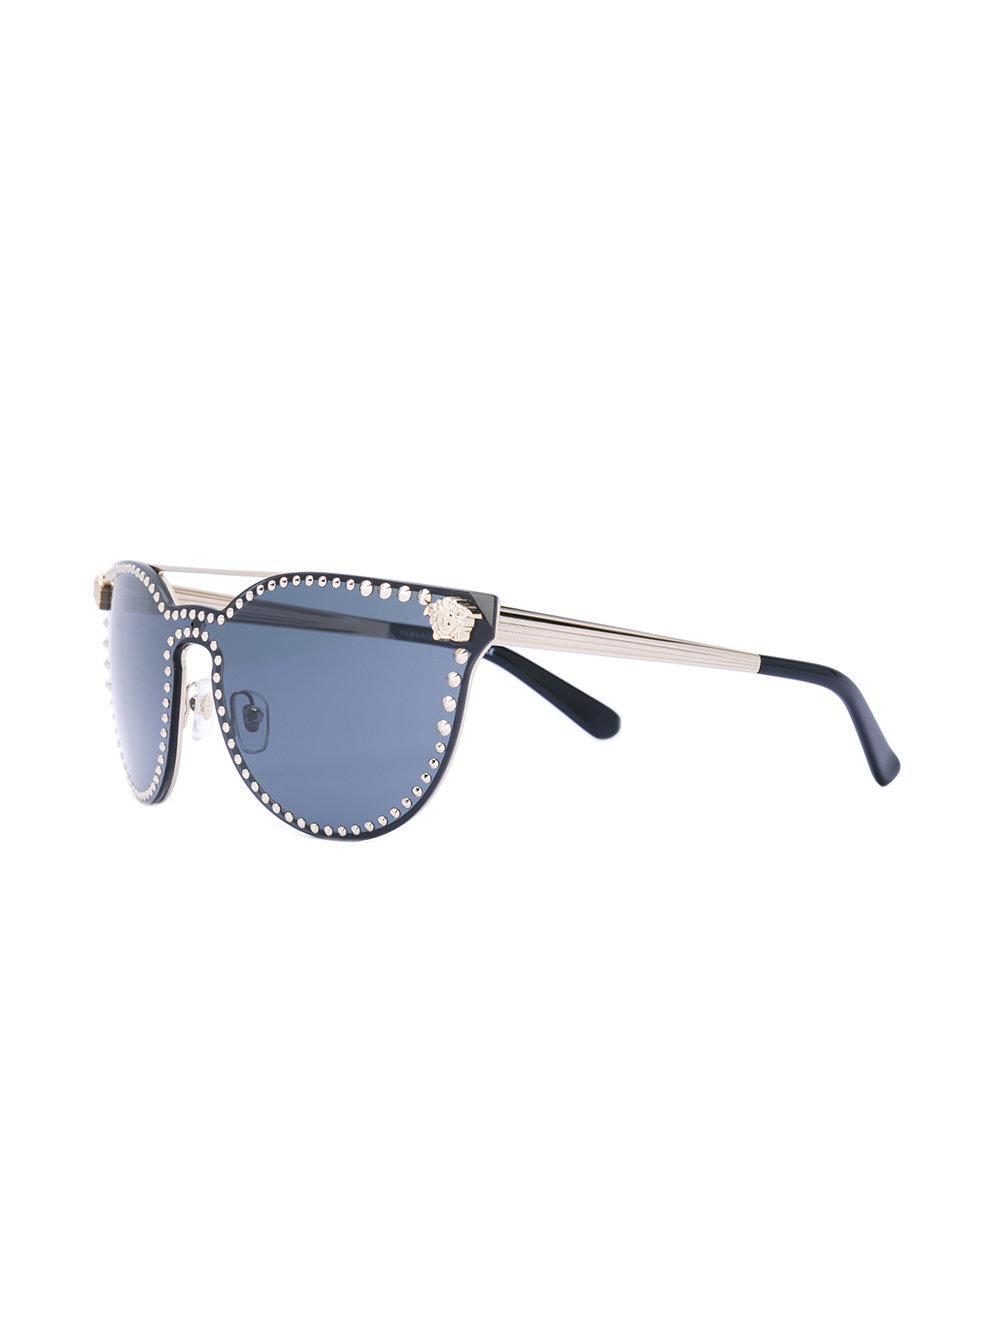 Versace Studded Medusa Sunglasses in Black